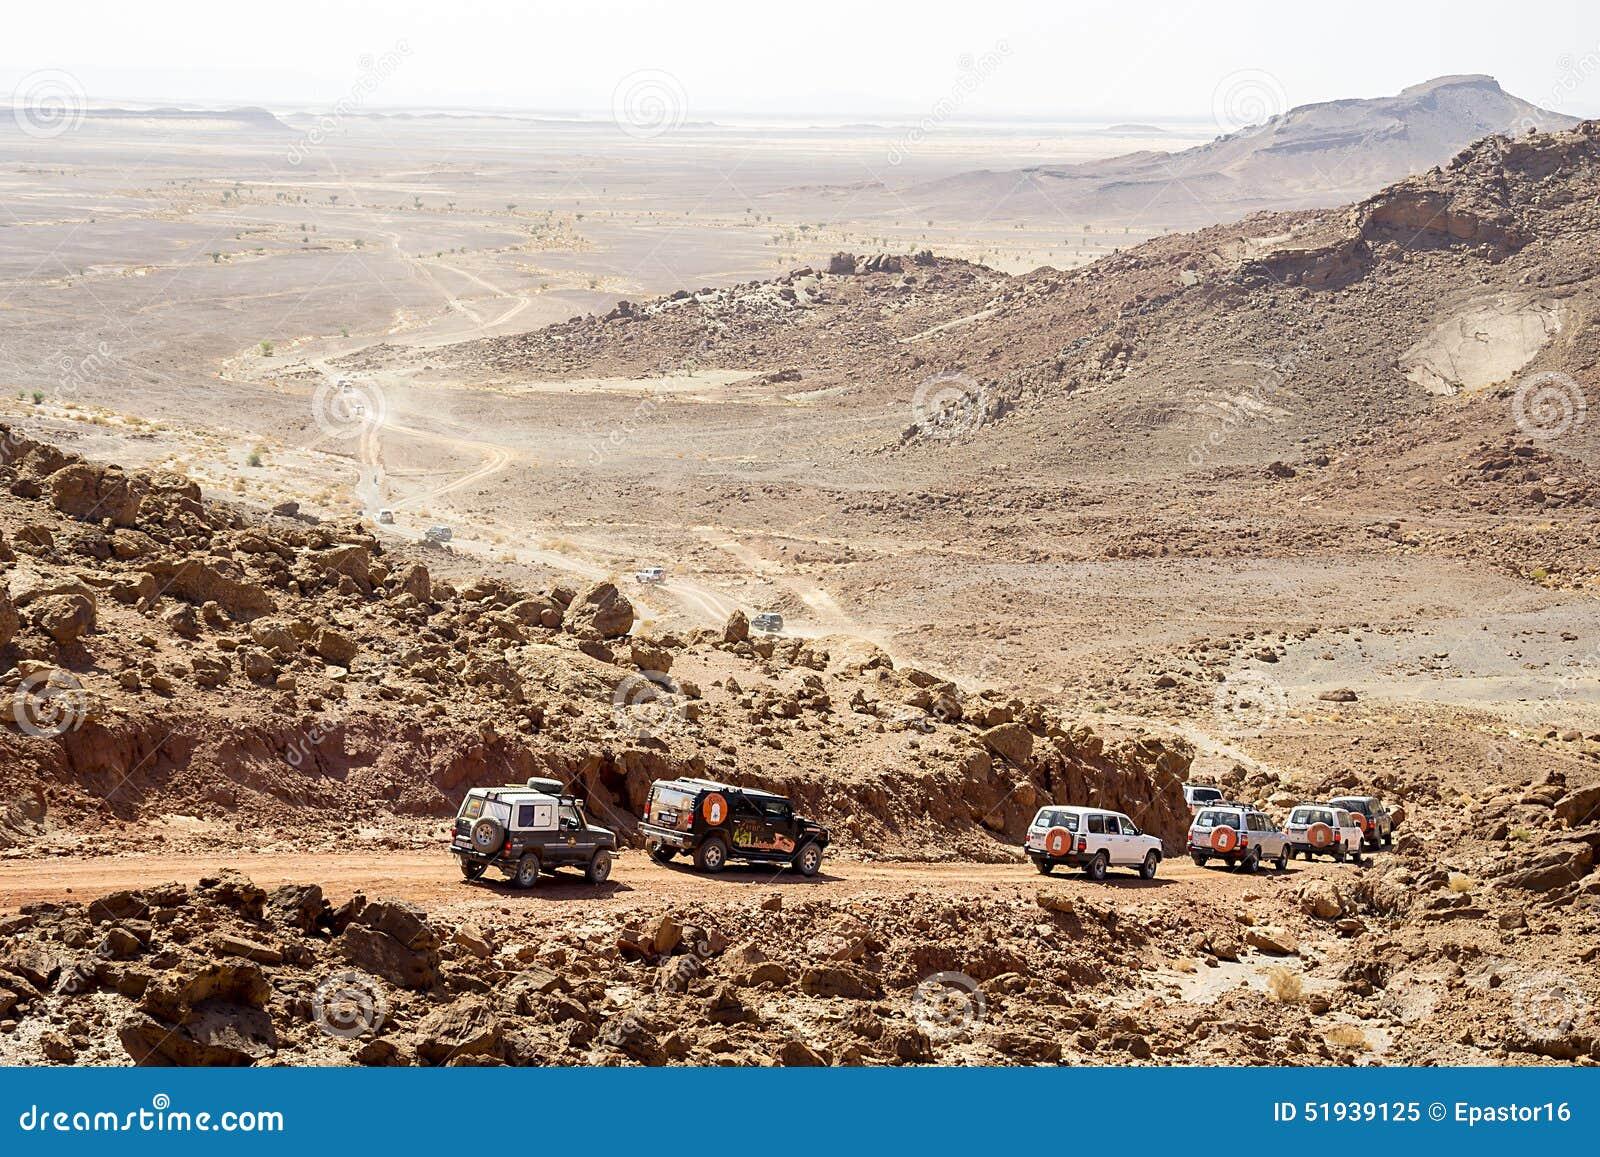 Errachidia Morocco  City new picture : errachidia morocco october 12 borgwarner supports 2015 dakar rally ...